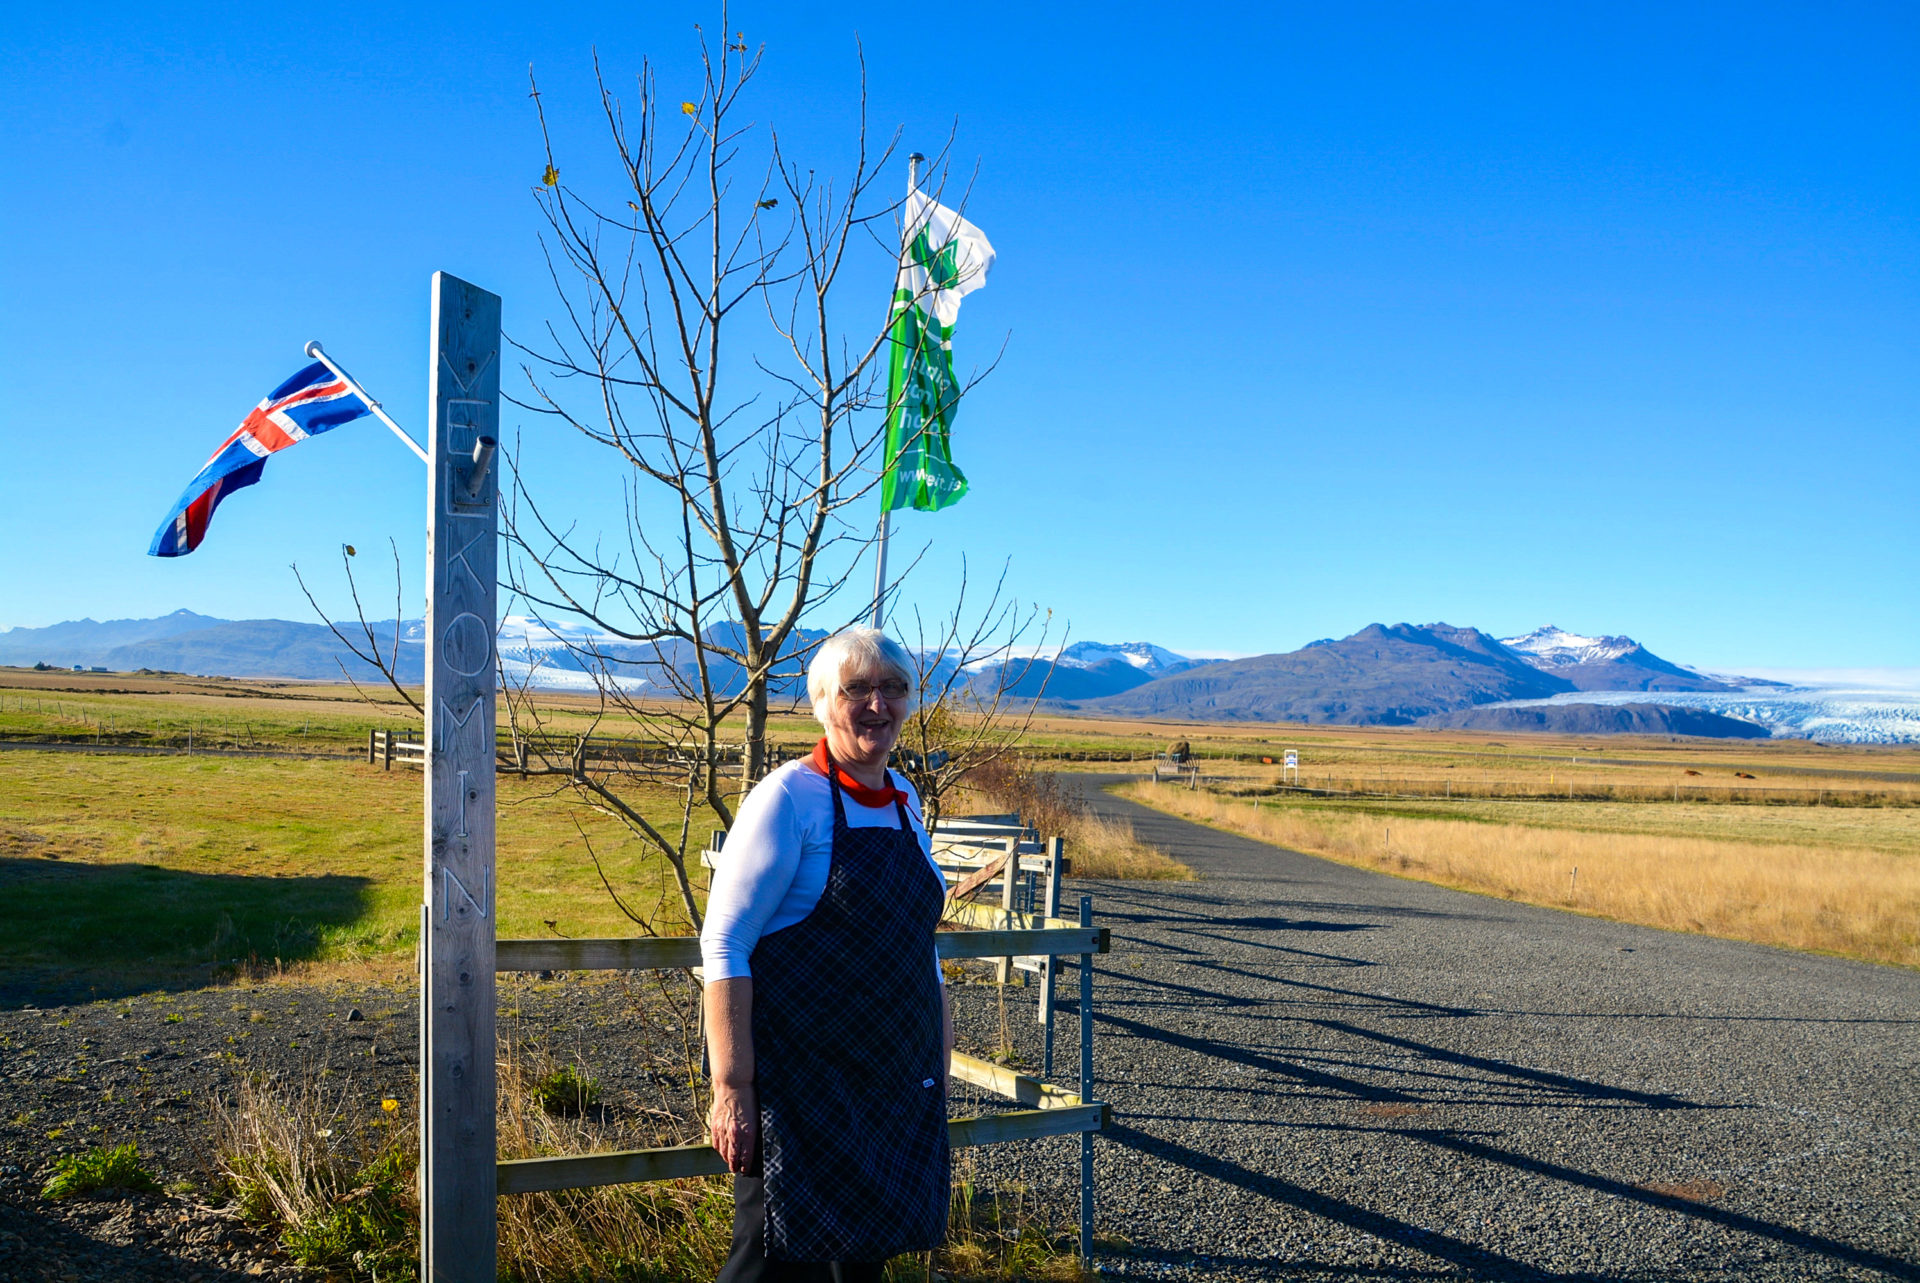 Bäuerin in Brunnholl beim Gletscher Vatnajökull an der isländischen Ringstrasse